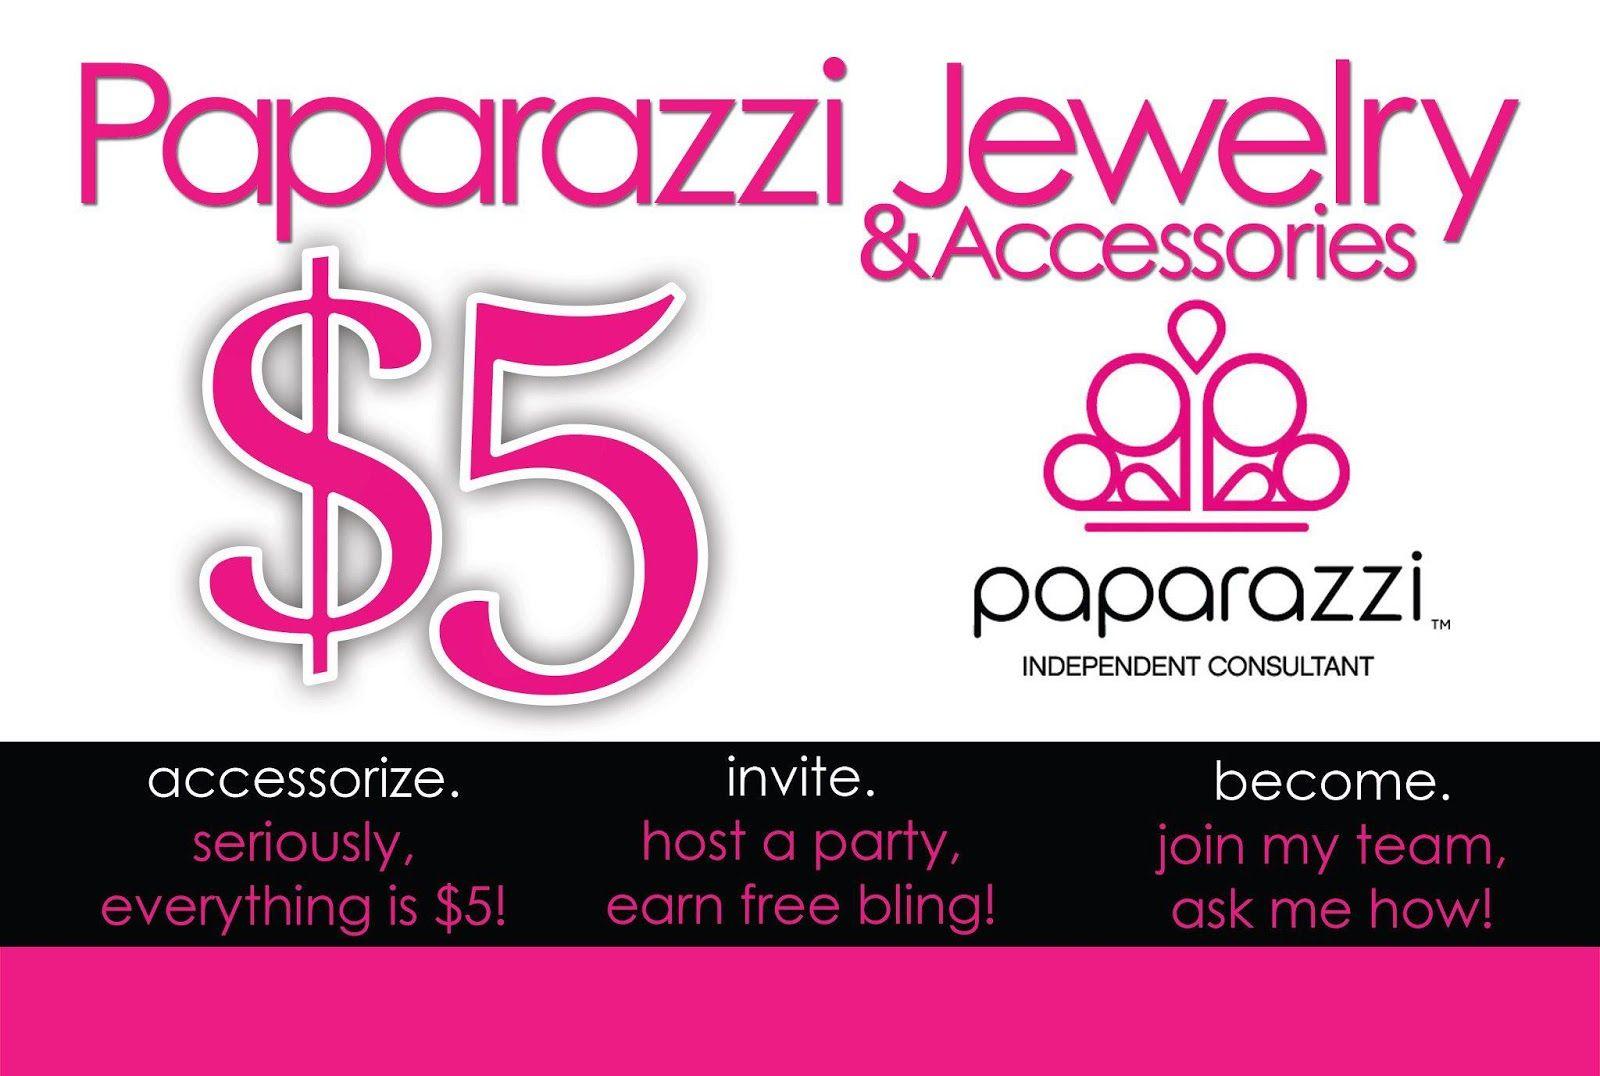 Paparazzi Jewelry And Accessories Accessories Invite Become